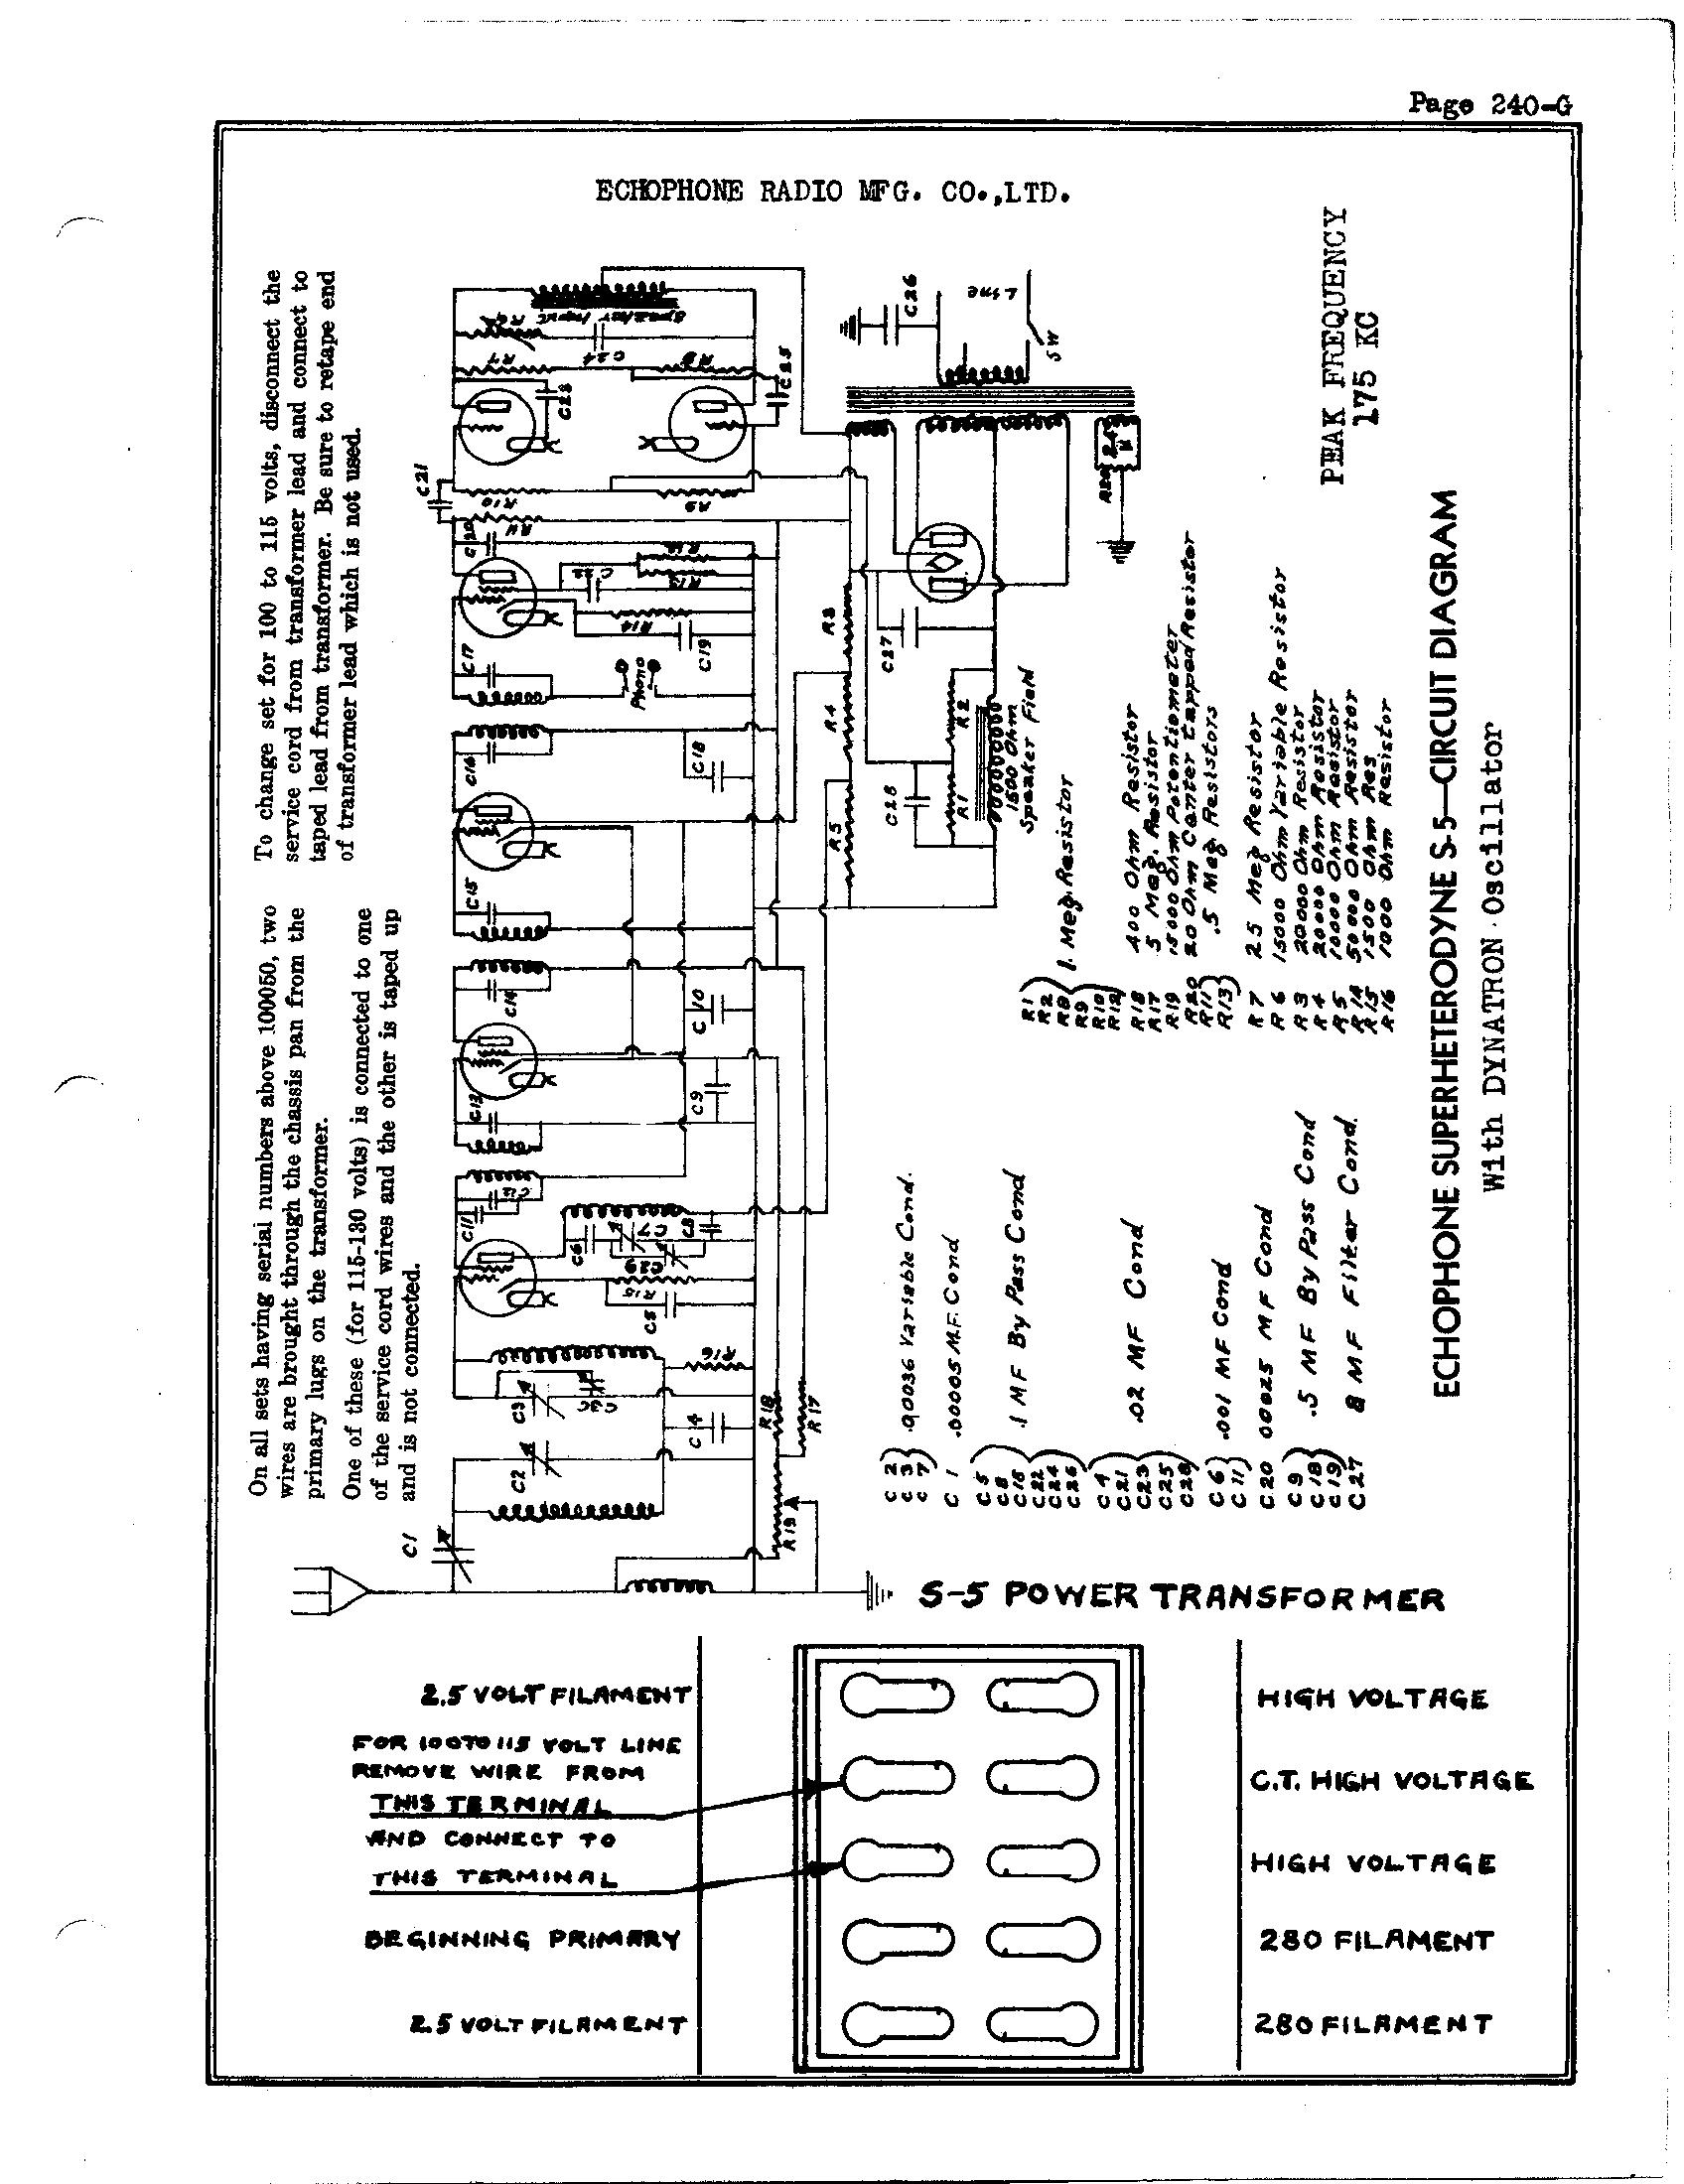 Echophone Radio Corp S 5